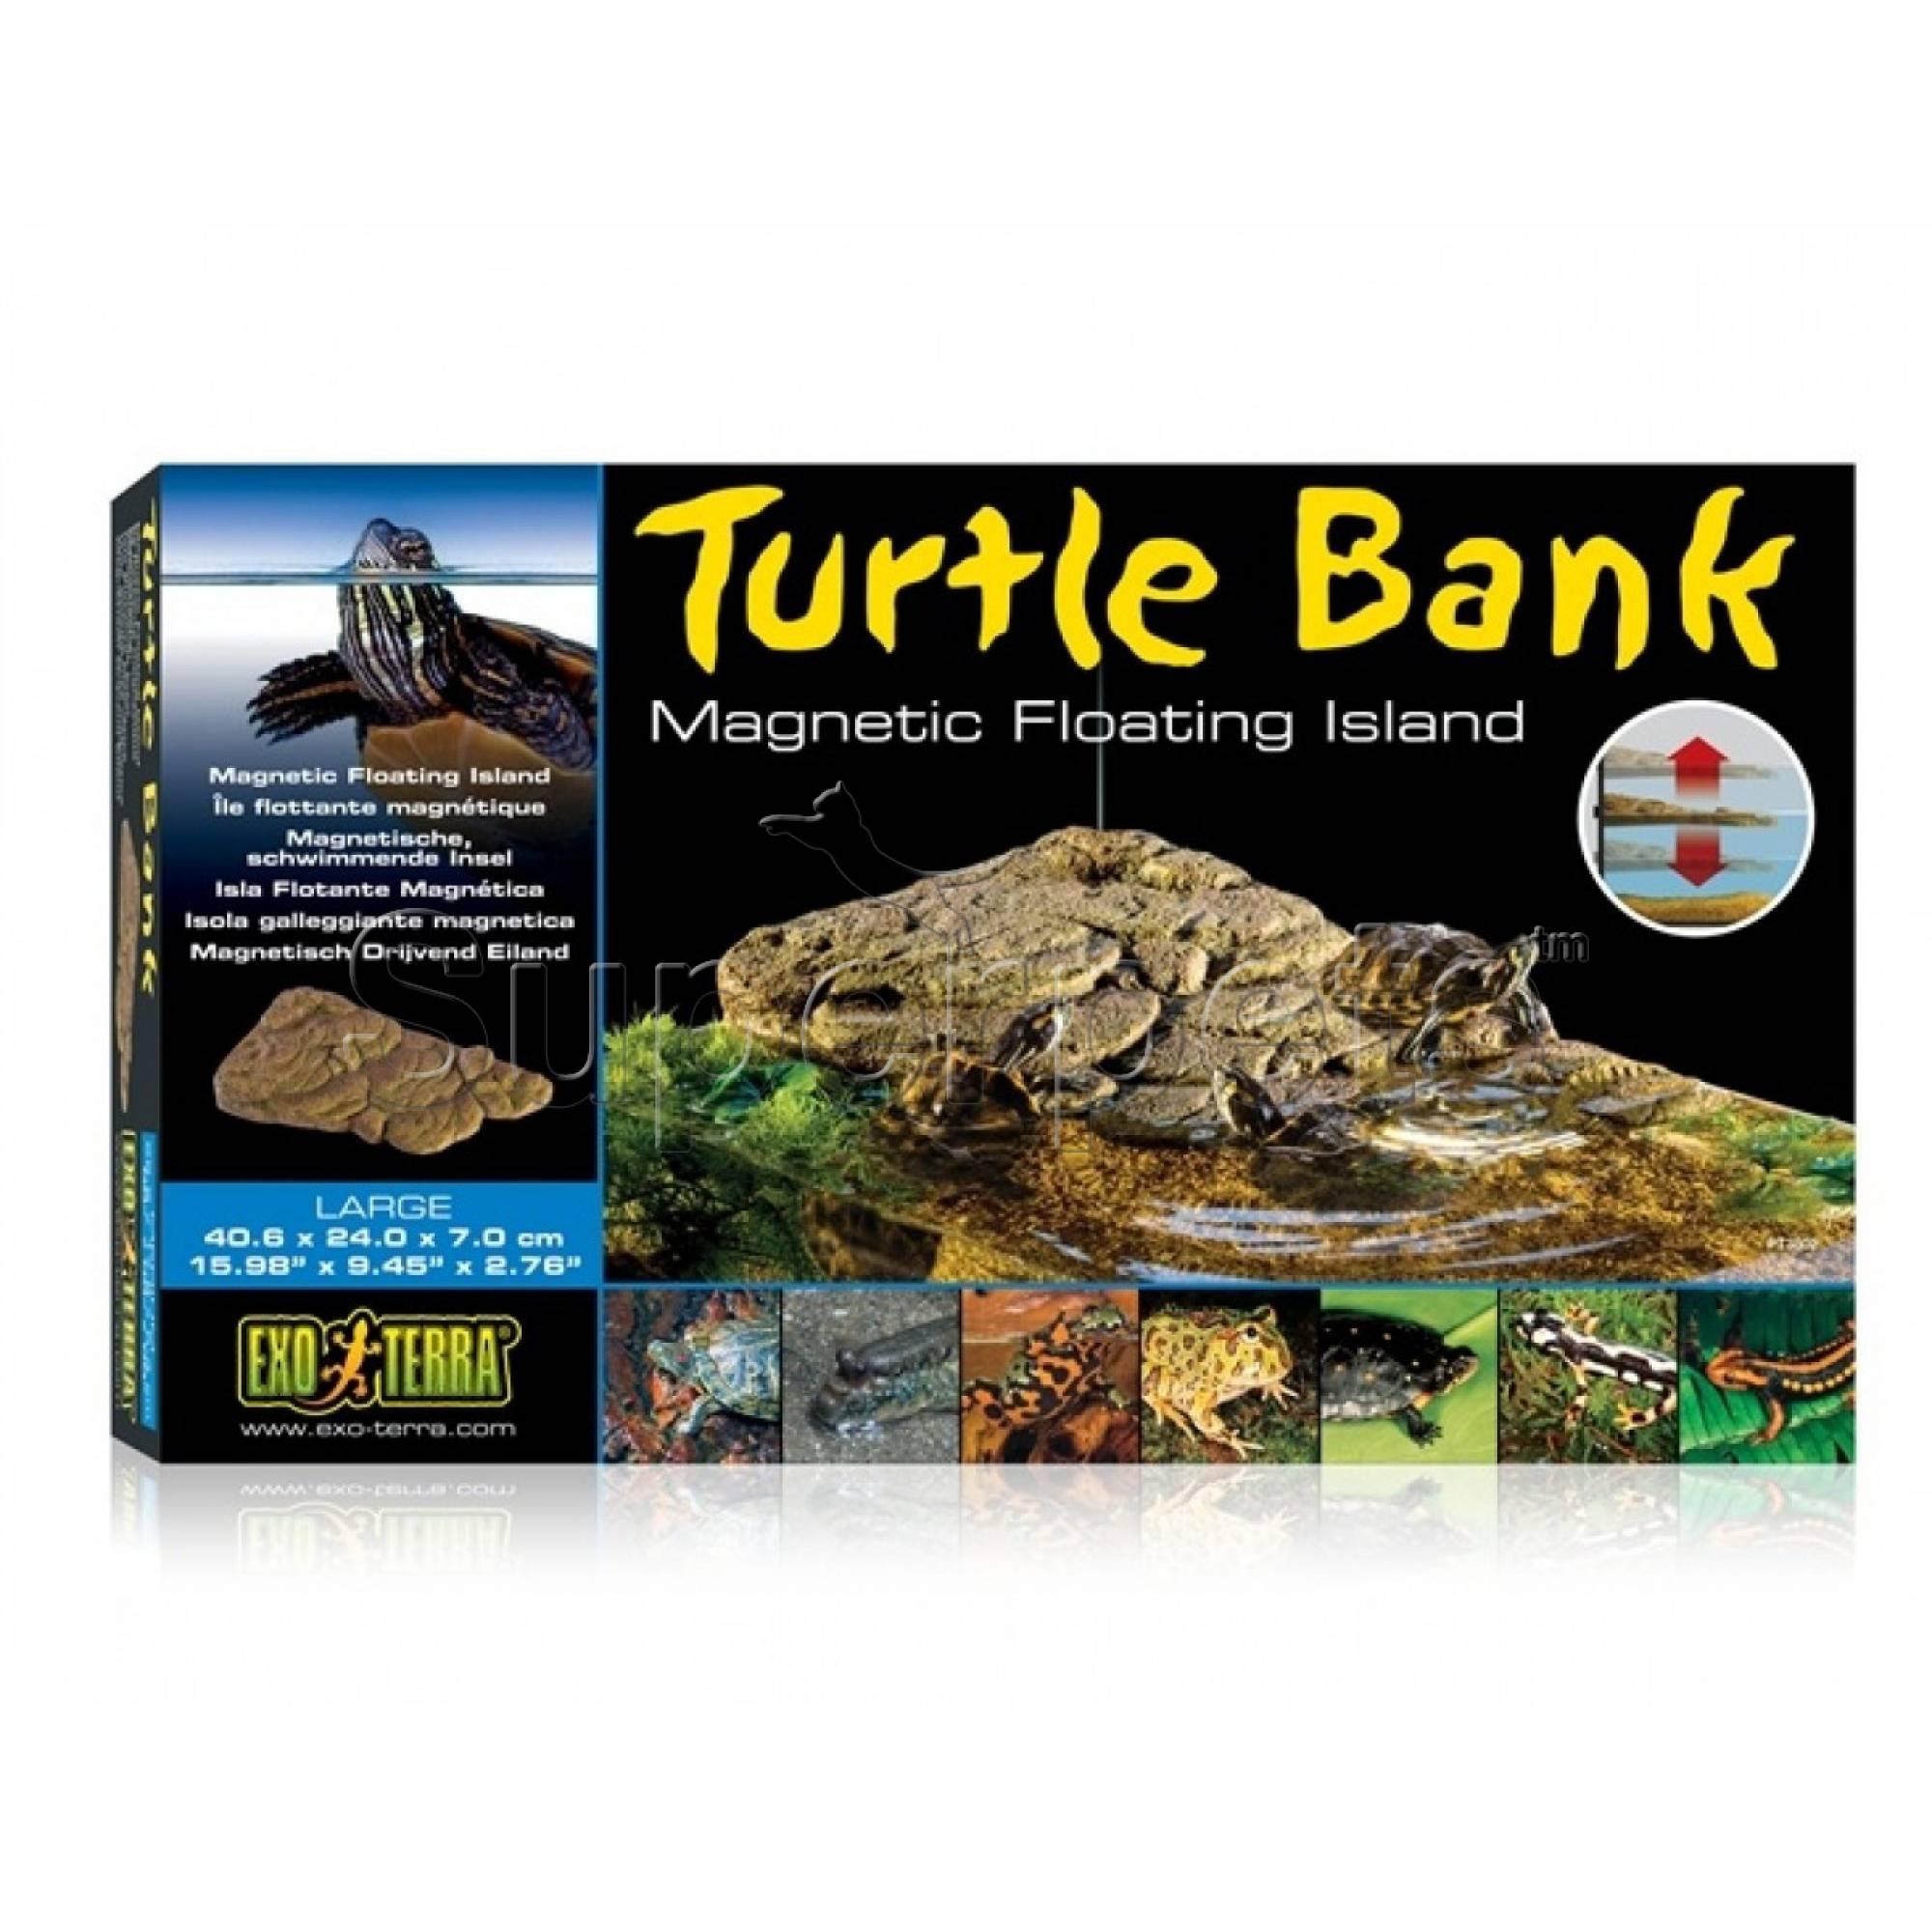 Exo Terra PT3802 Turtle Bank Magnetic Floating Island Large 40x24x7cm